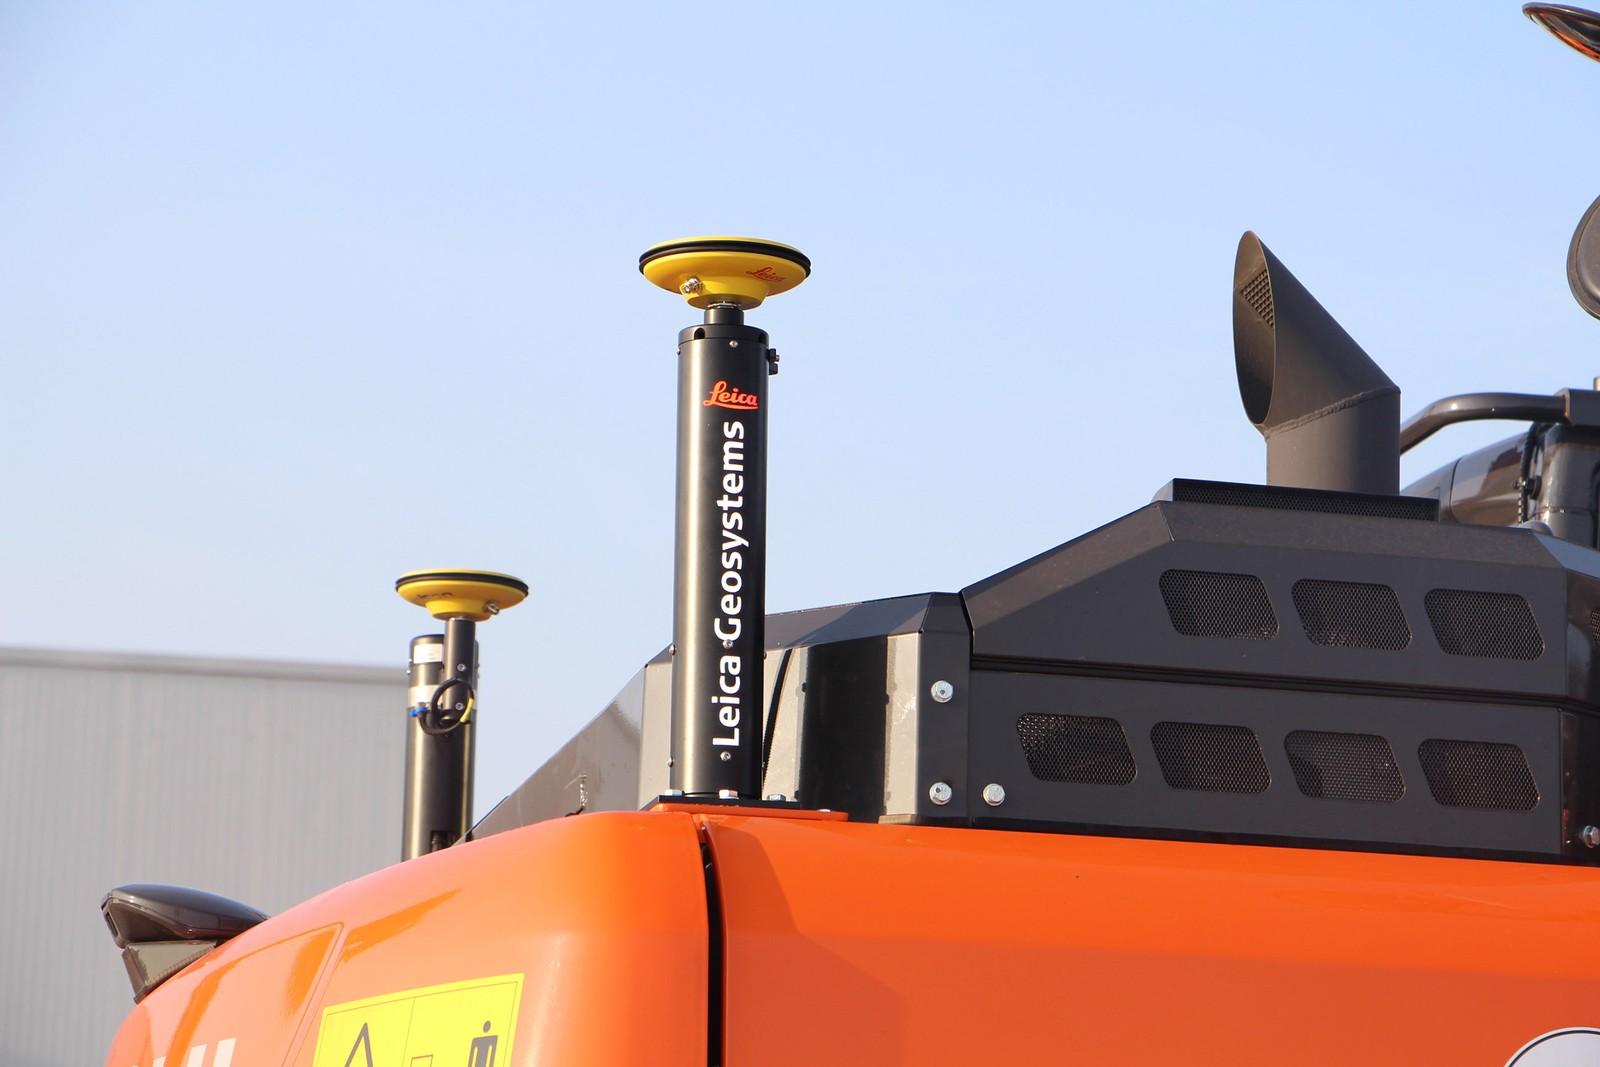 Dank GNSS-Empfänger am Heck der Maschinen kann der Bauprozess millimetergenau gesteuert werden.